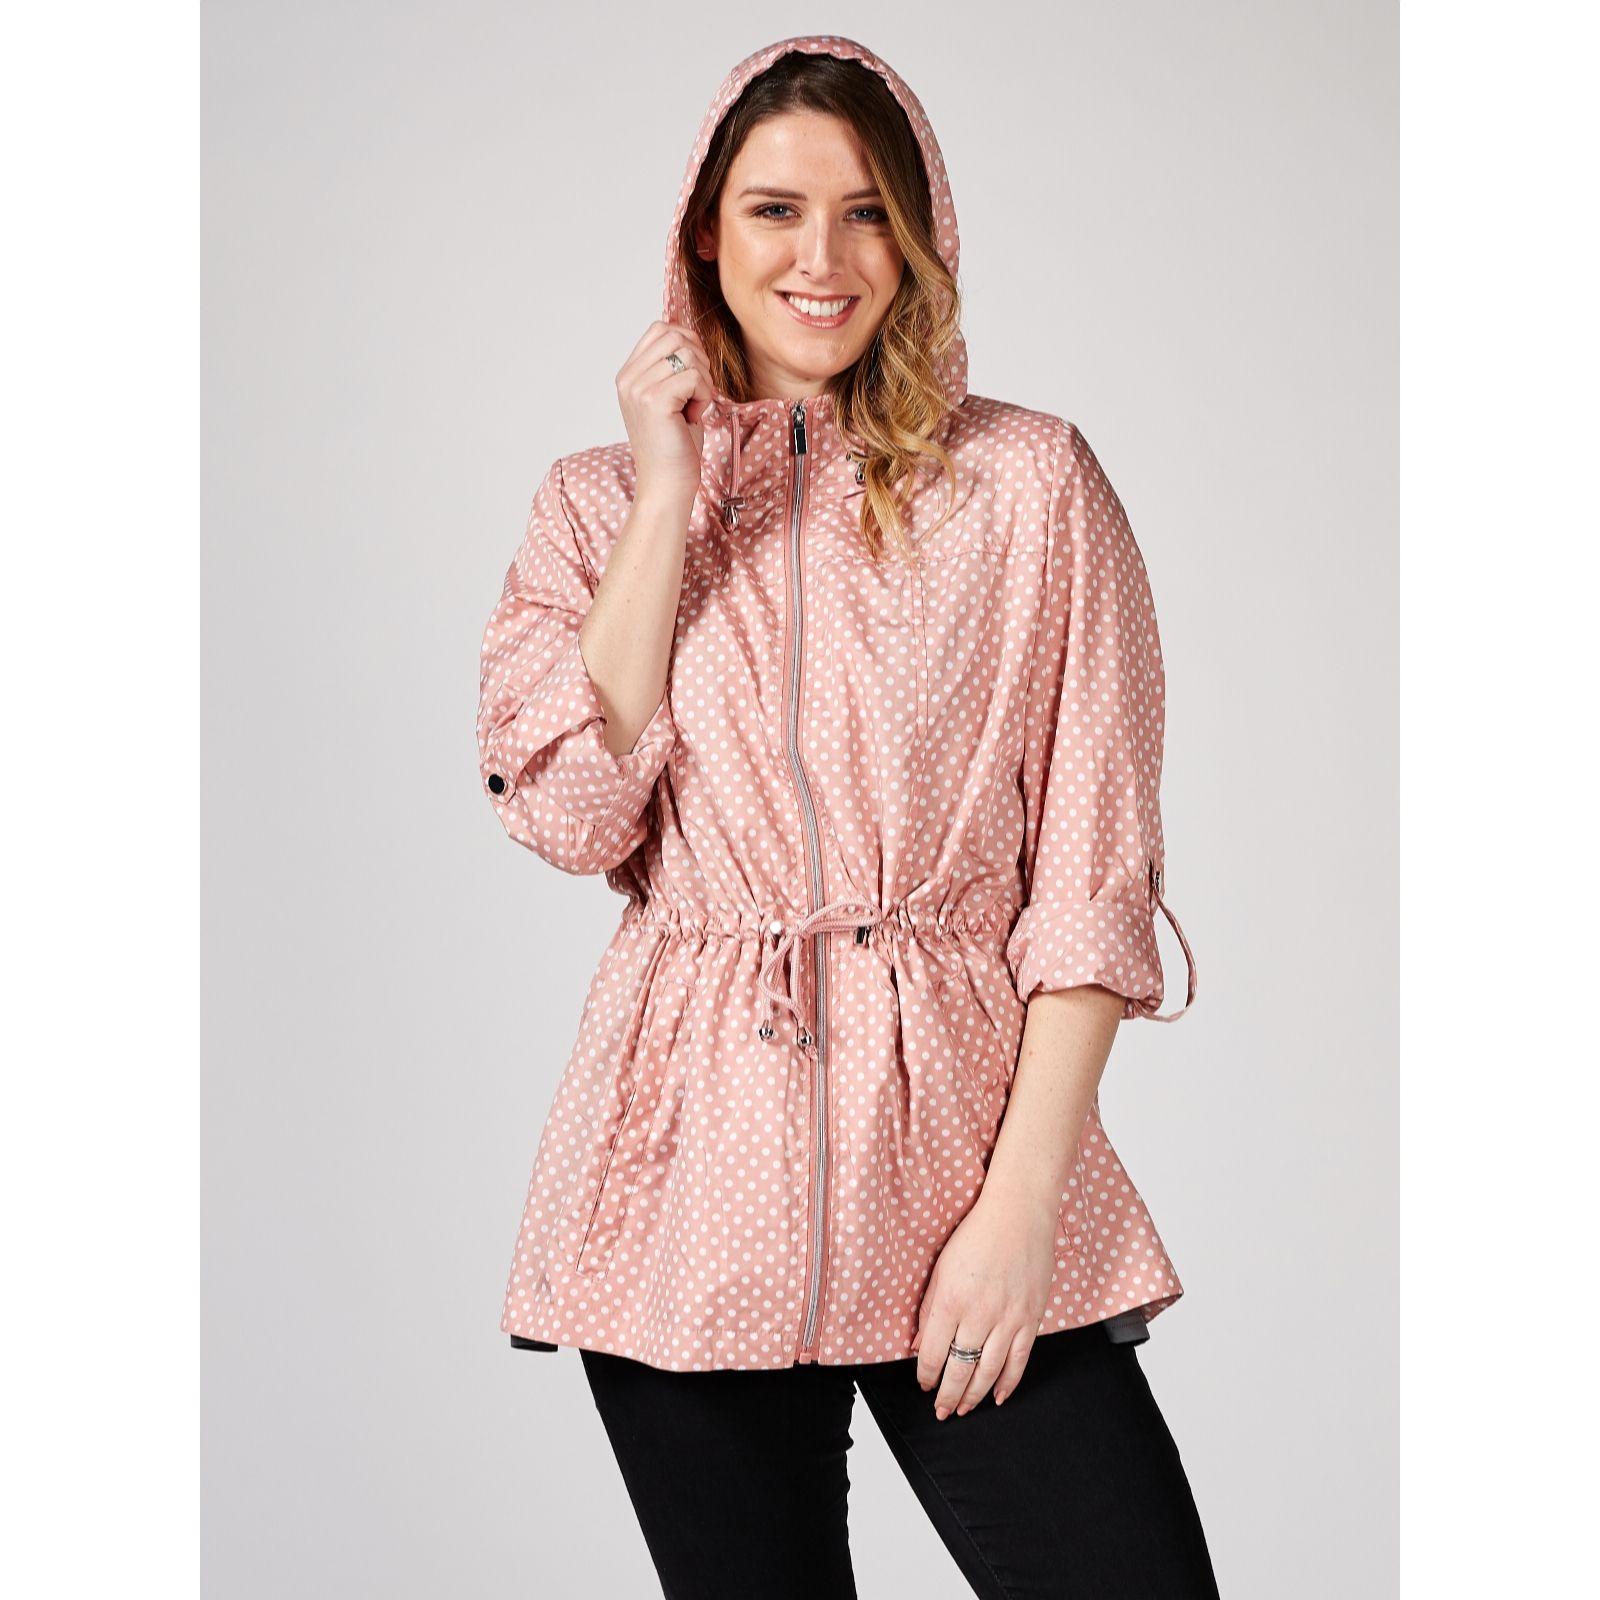 ba25897a60ee Waterproof Hooded Jacket with Long Roll Up Sleeves by Nina Leonard - QVC UK